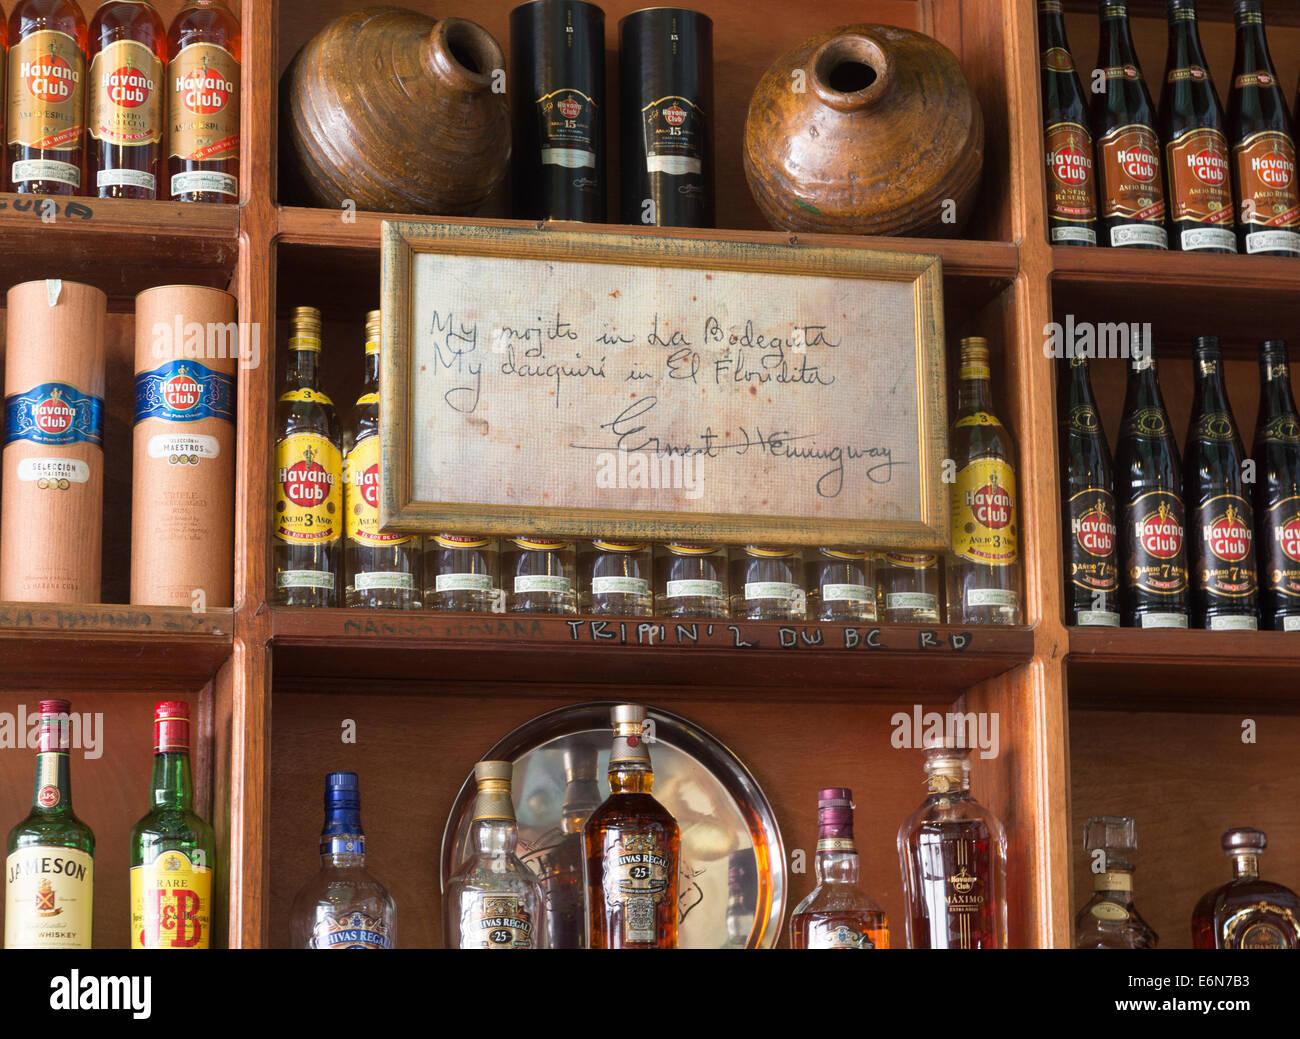 "Signieren von Hemingway, ""my Mojito in La Bodeguita"", La Bodeguita del Medio Bar, Havanna, Kuba Stockbild"